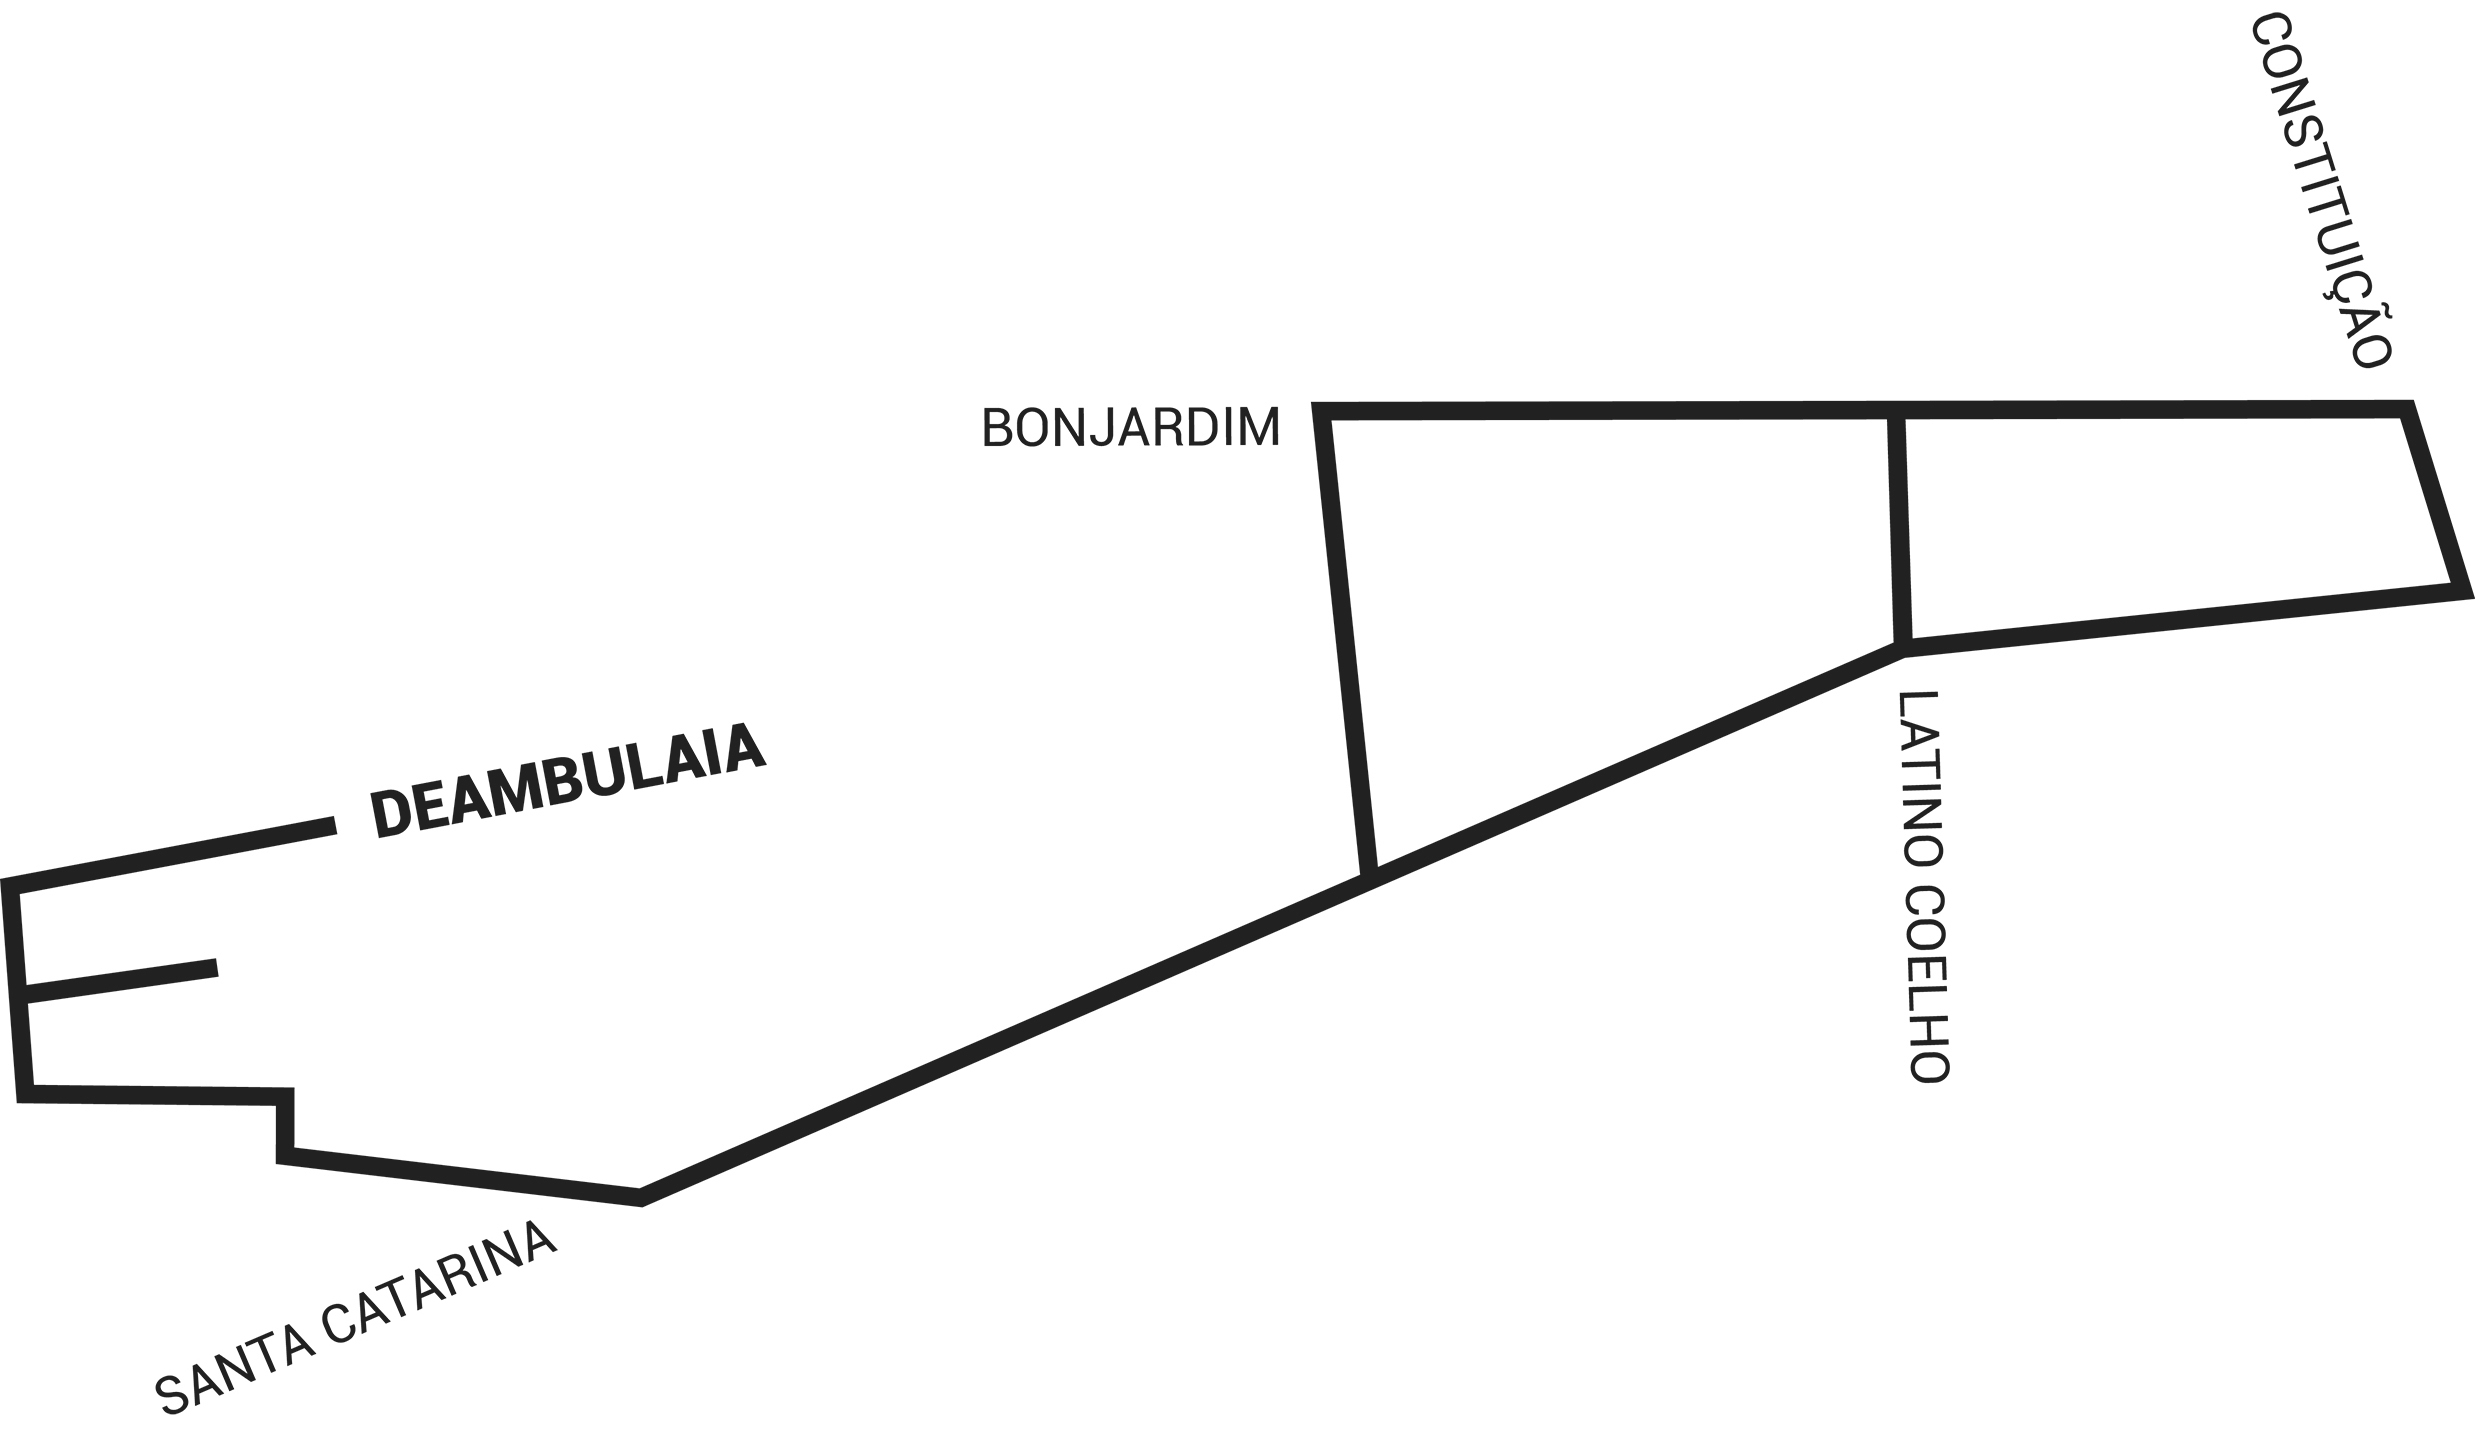 Mapa Fundacao Deambulaia bonjourmolotov website.jpg